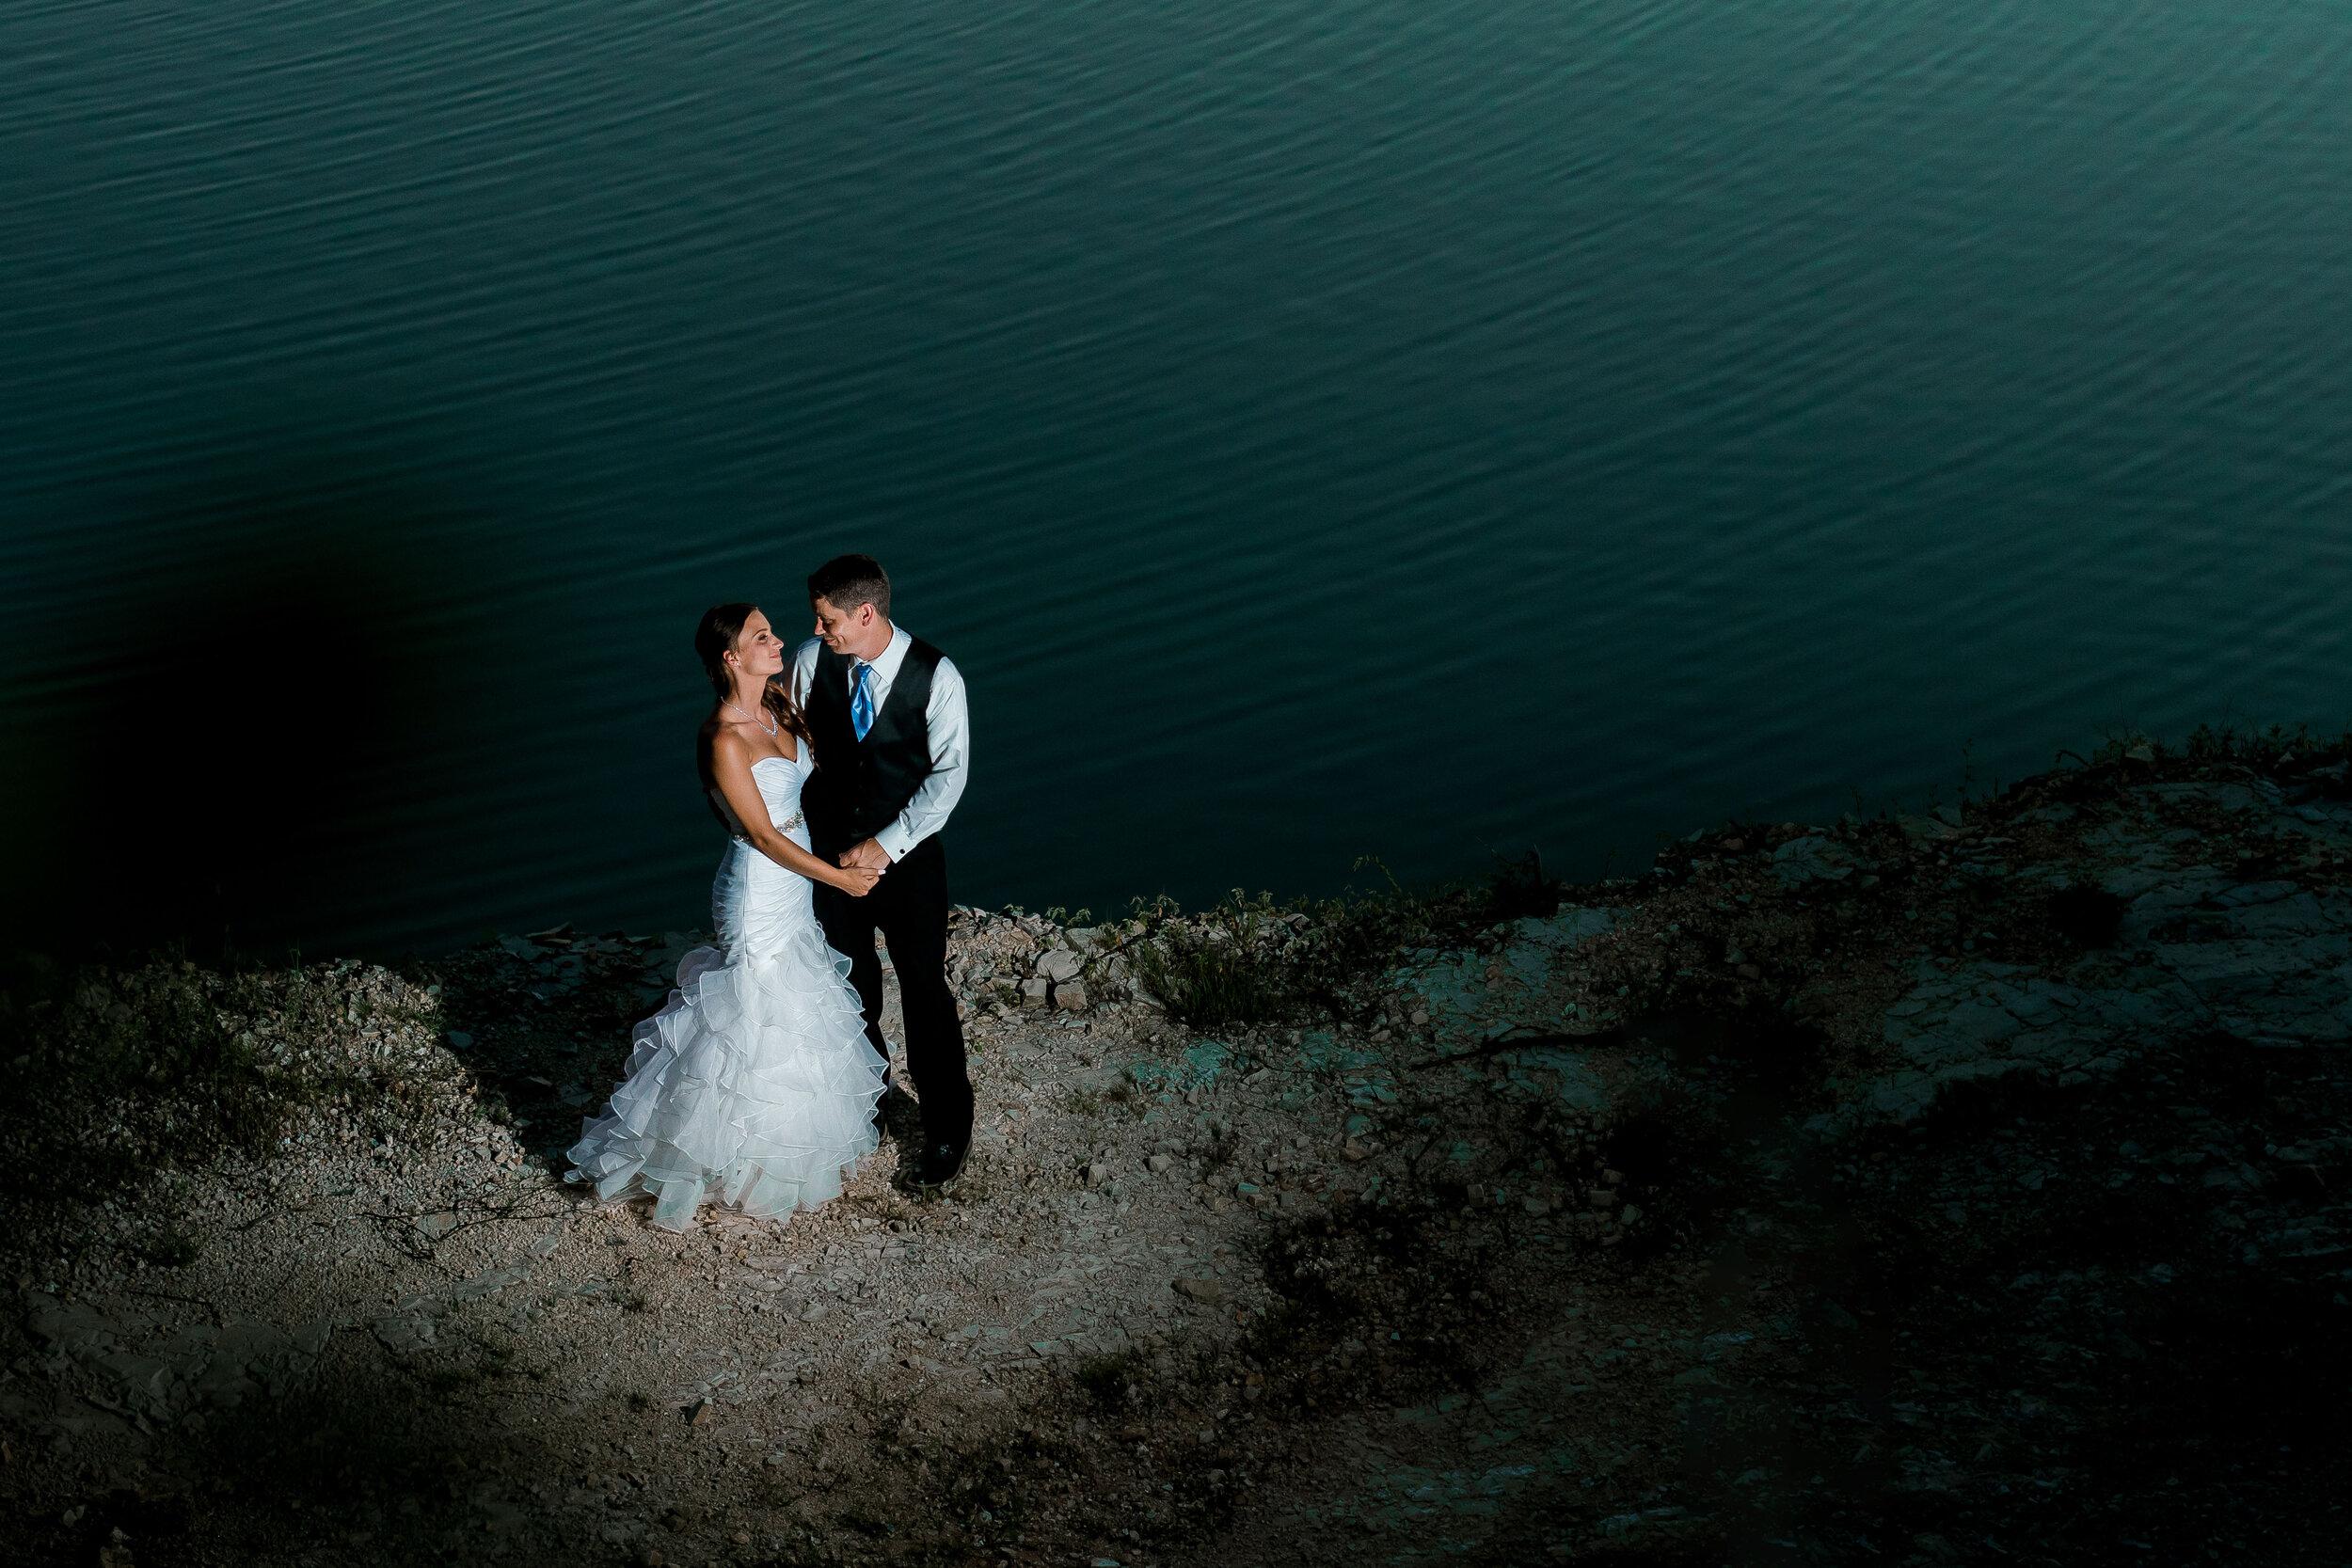 071319_Wedding_Amber_Stephen (386 of 393).jpg